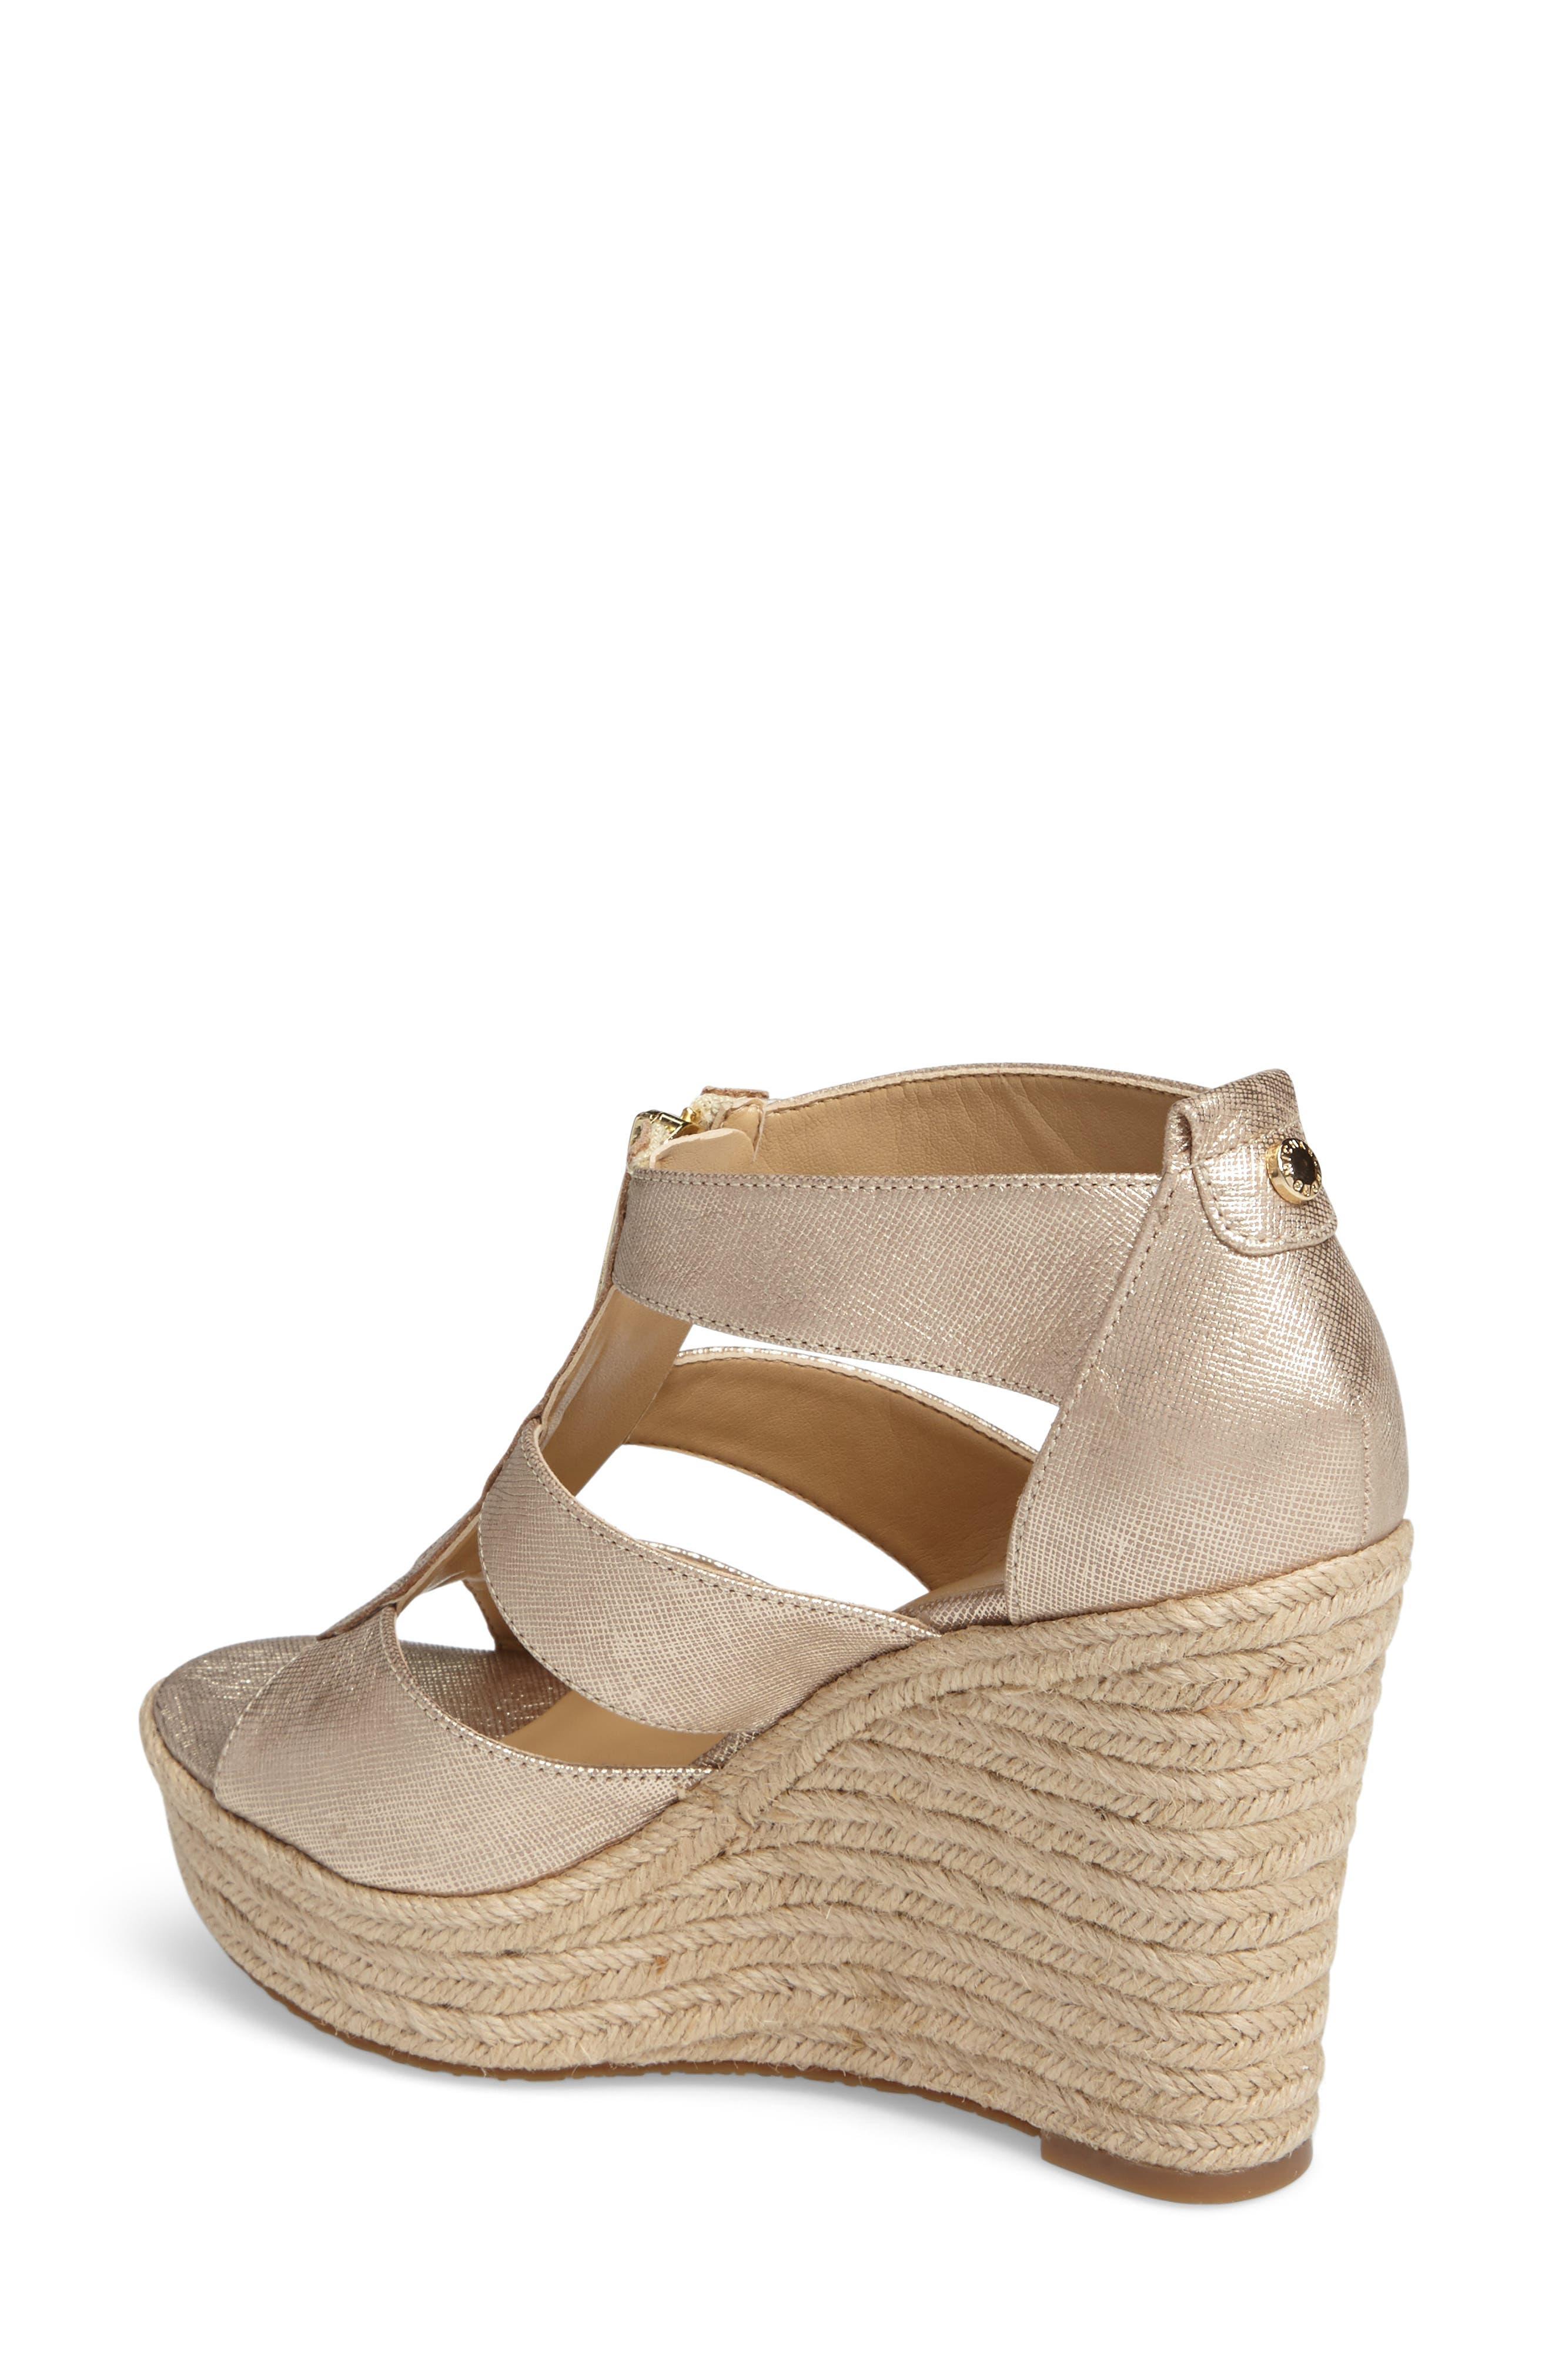 Alternate Image 2  - MICHAEL Michael Kors 'Damita' Wedge Sandal (Women)